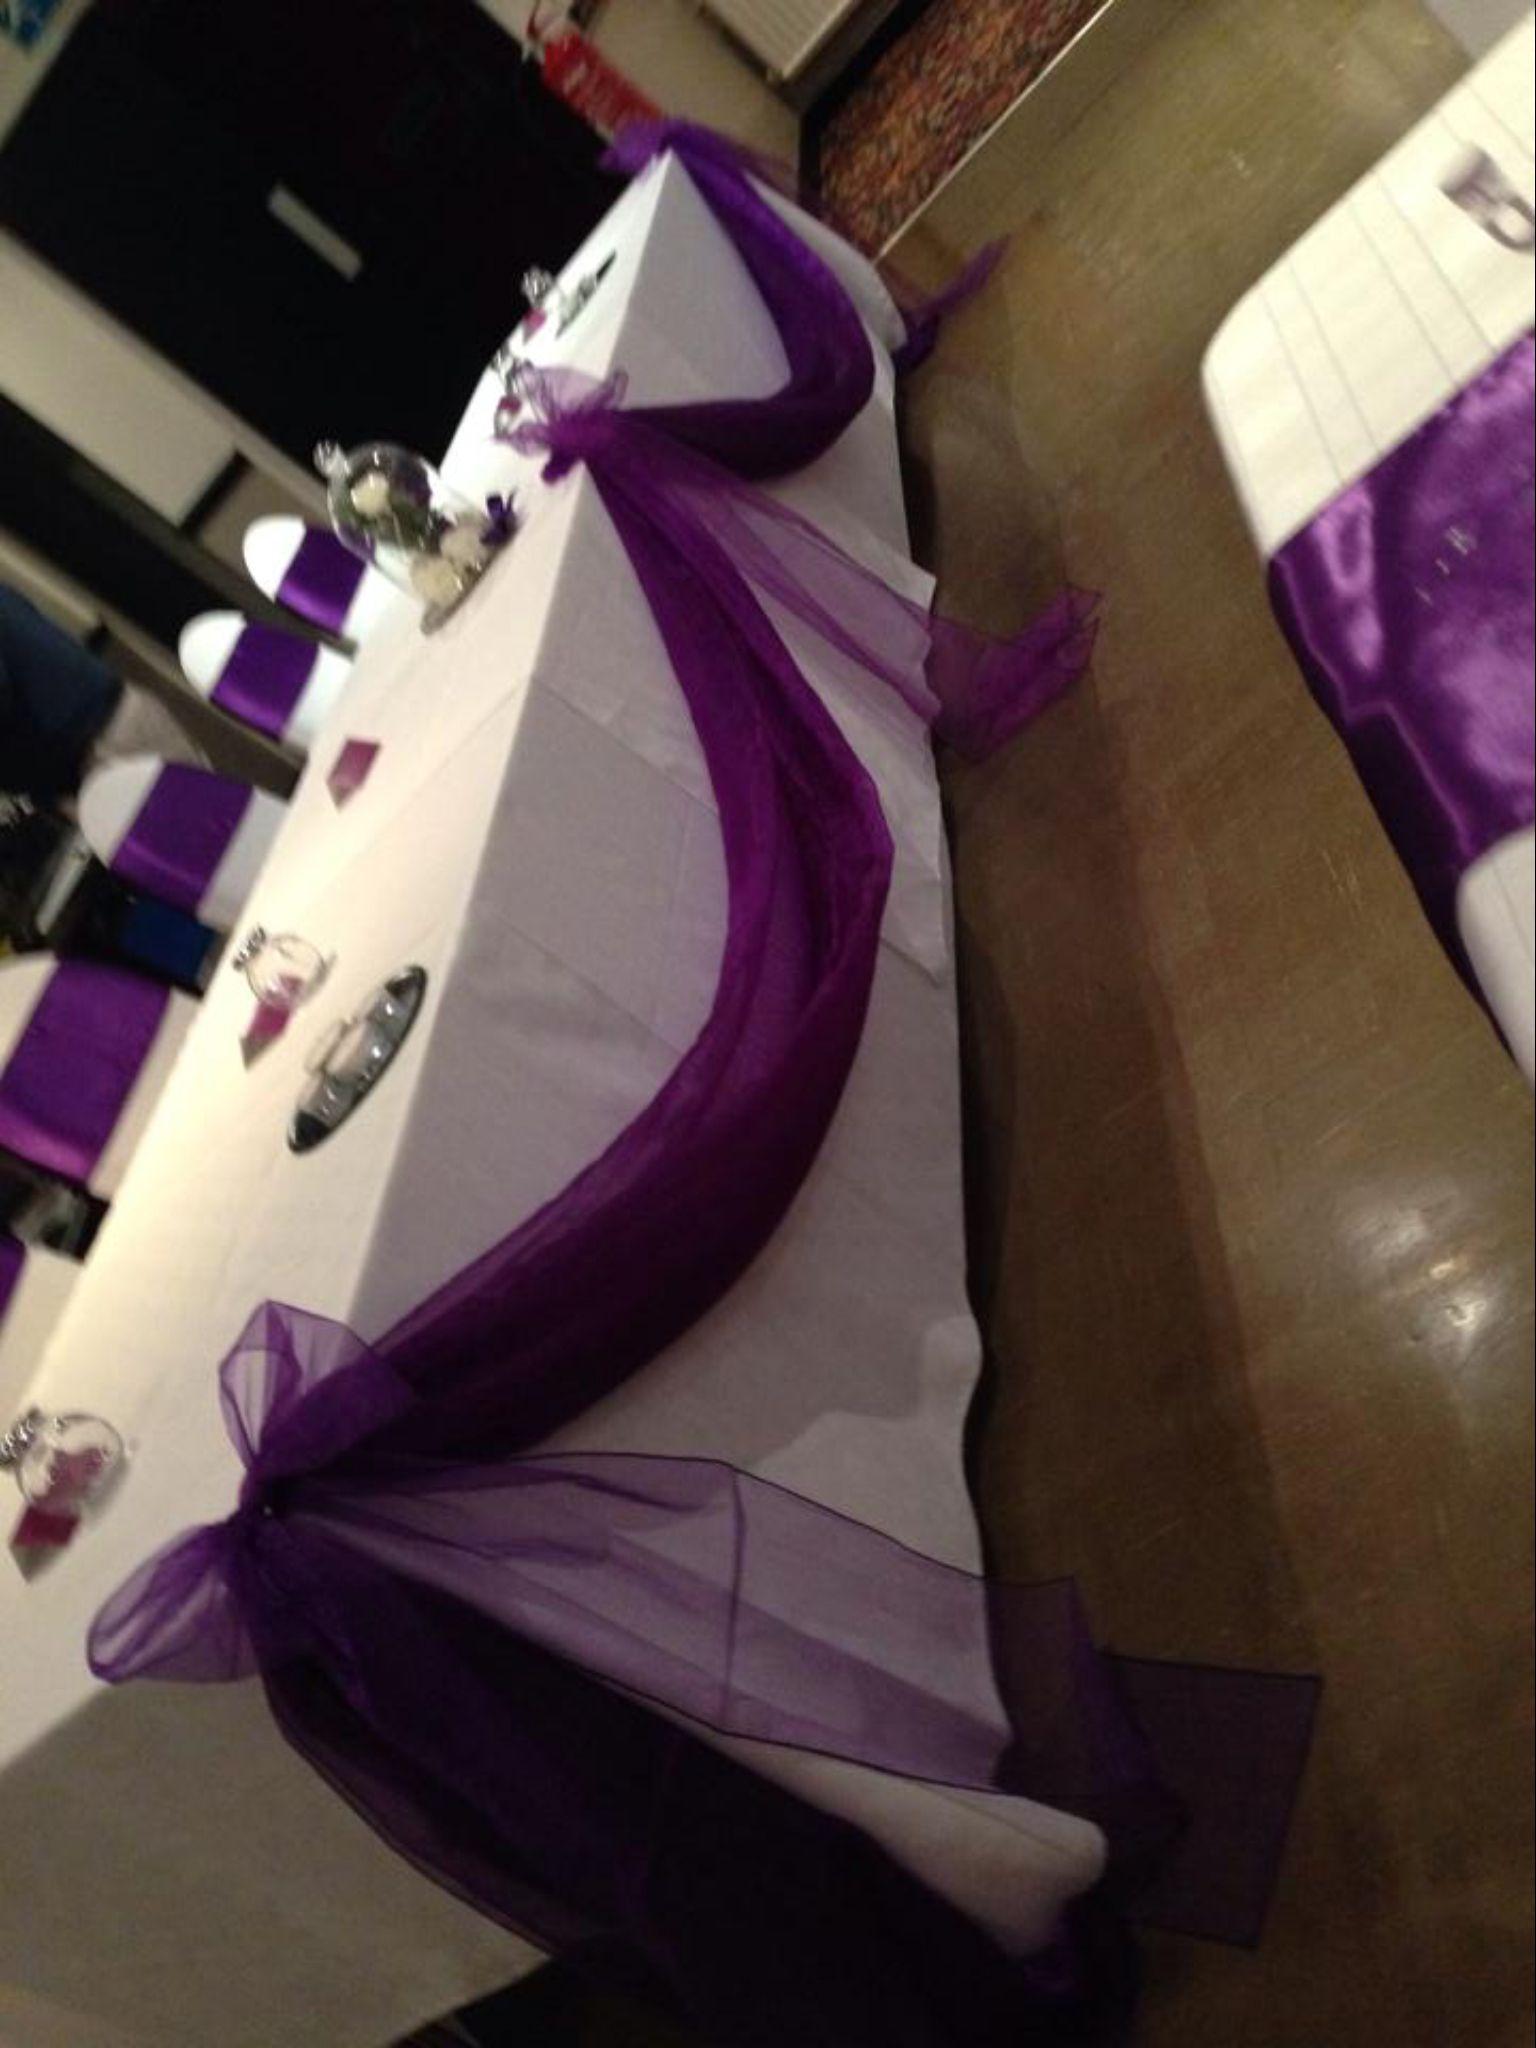 Cadbury Purple Satin Sashes With White Spandex Chaircovers